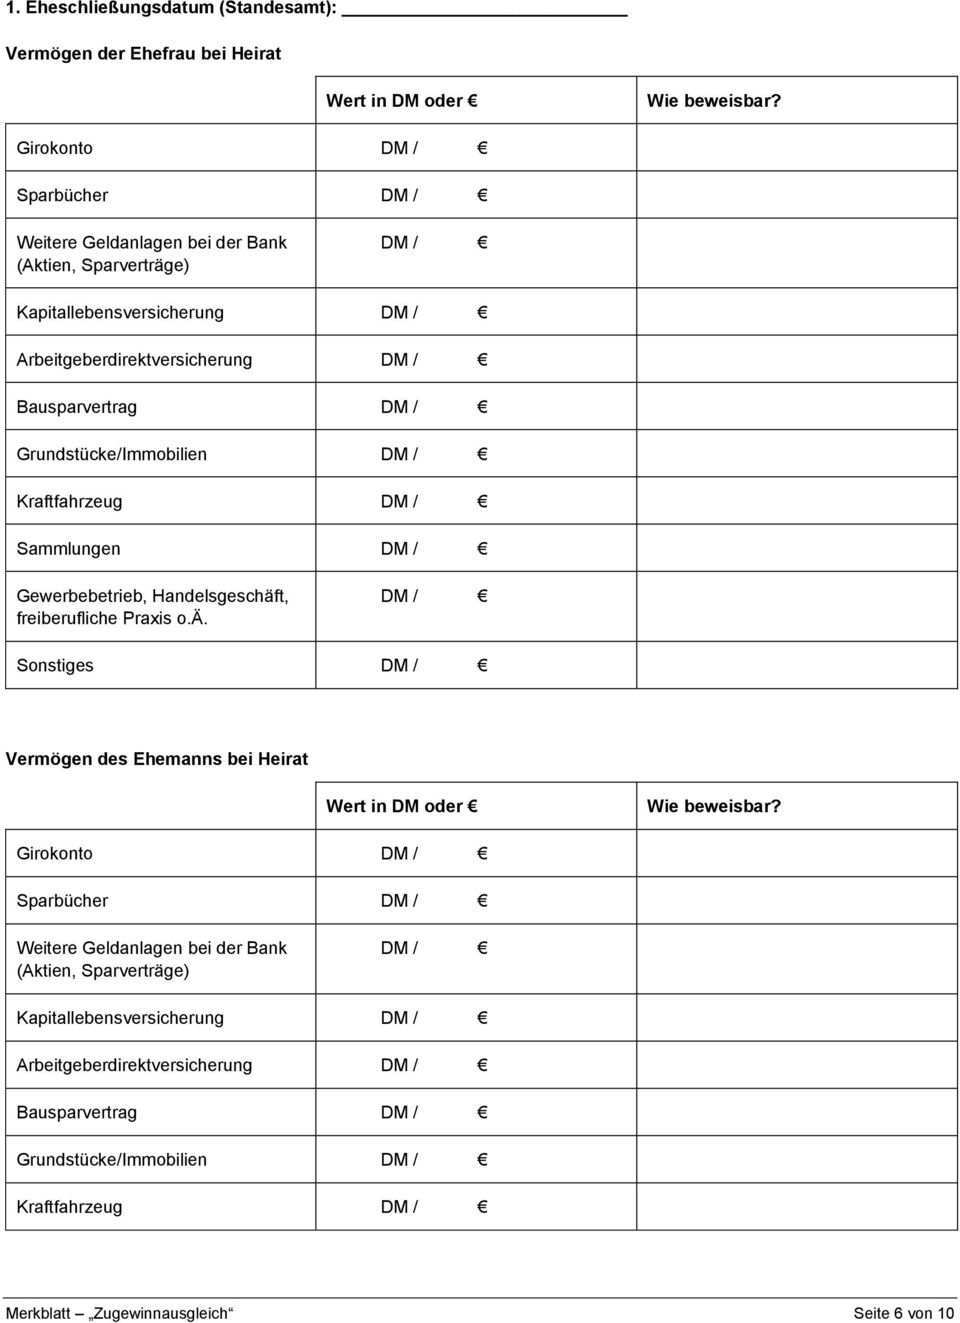 Merkblatt Zugewinnausgleich Pdf Free Download